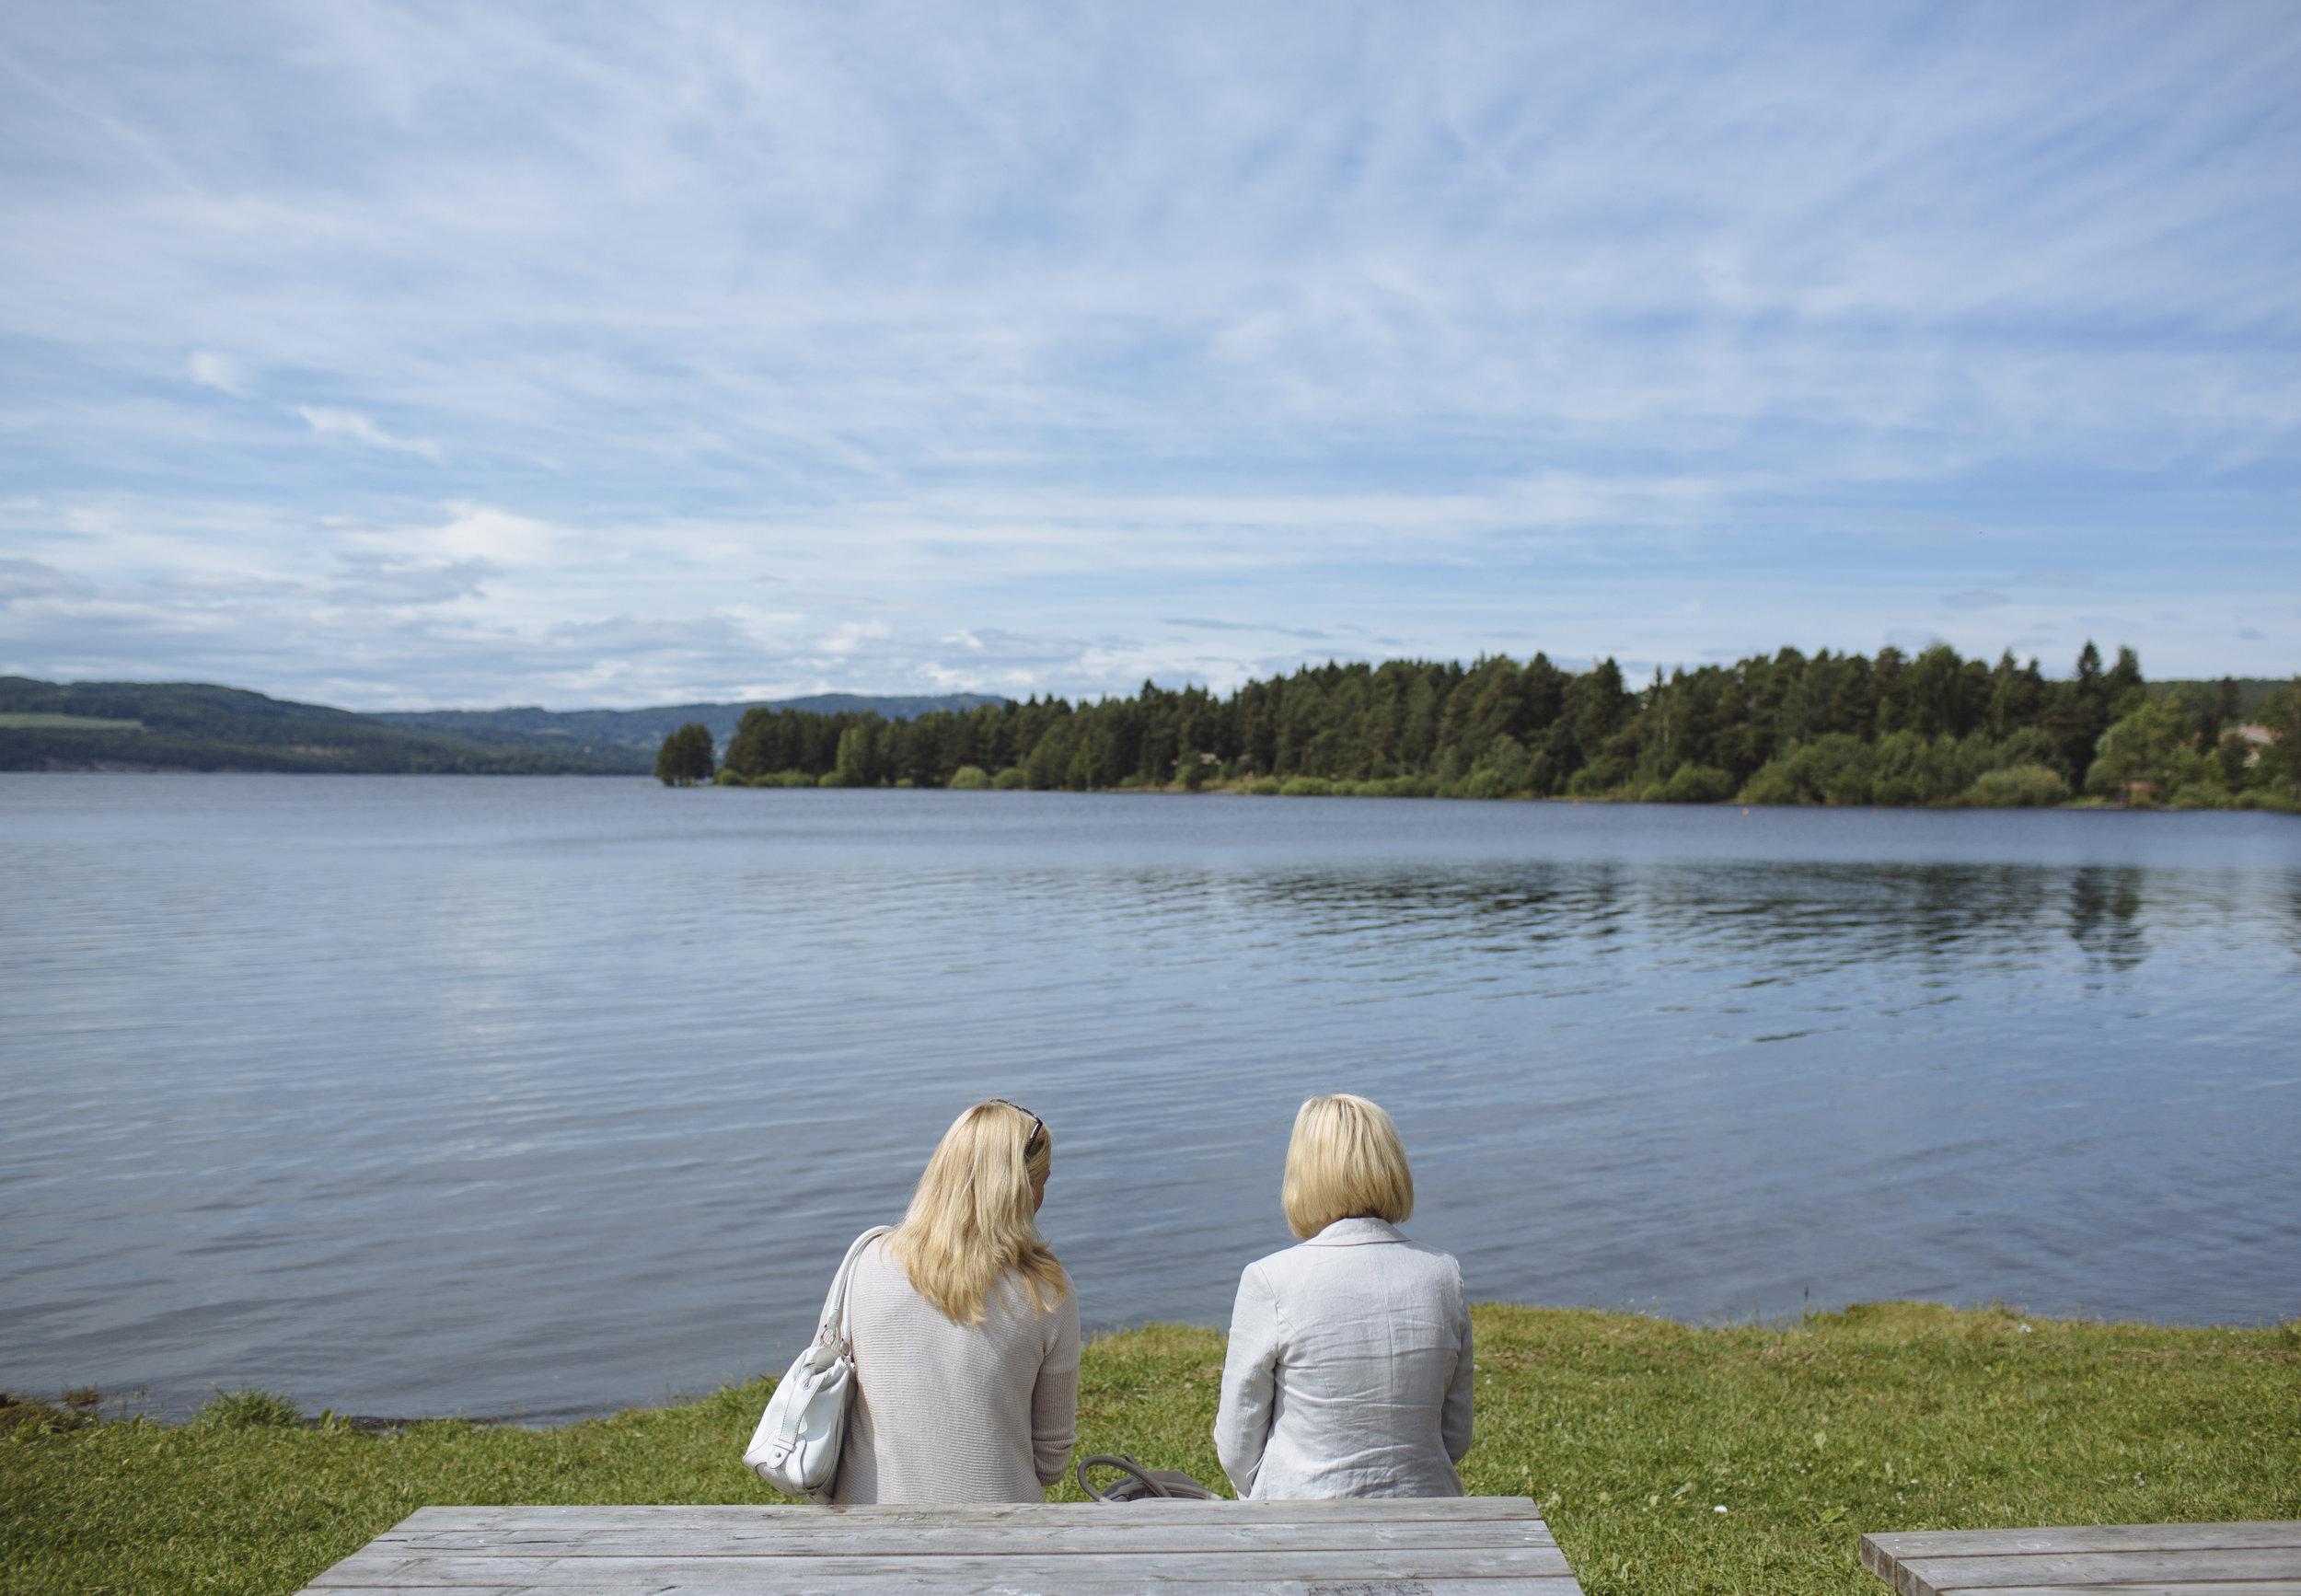 20_Personal_Norge.jpg